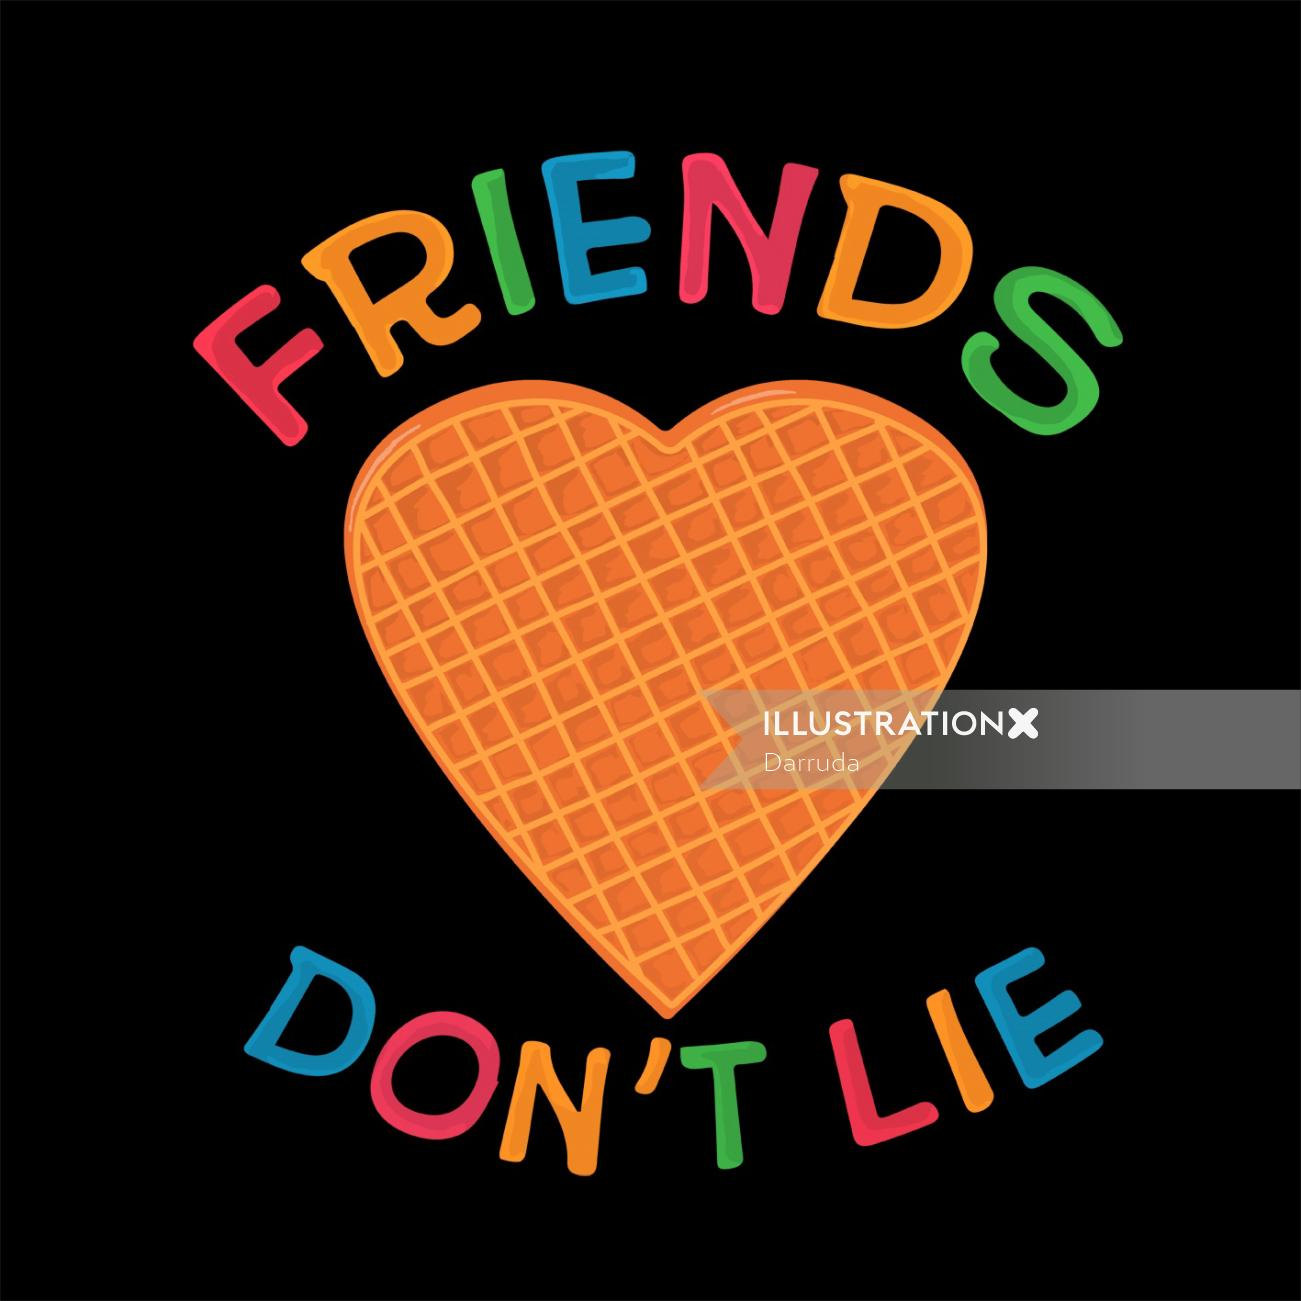 Lettering illustration of friends don't lie